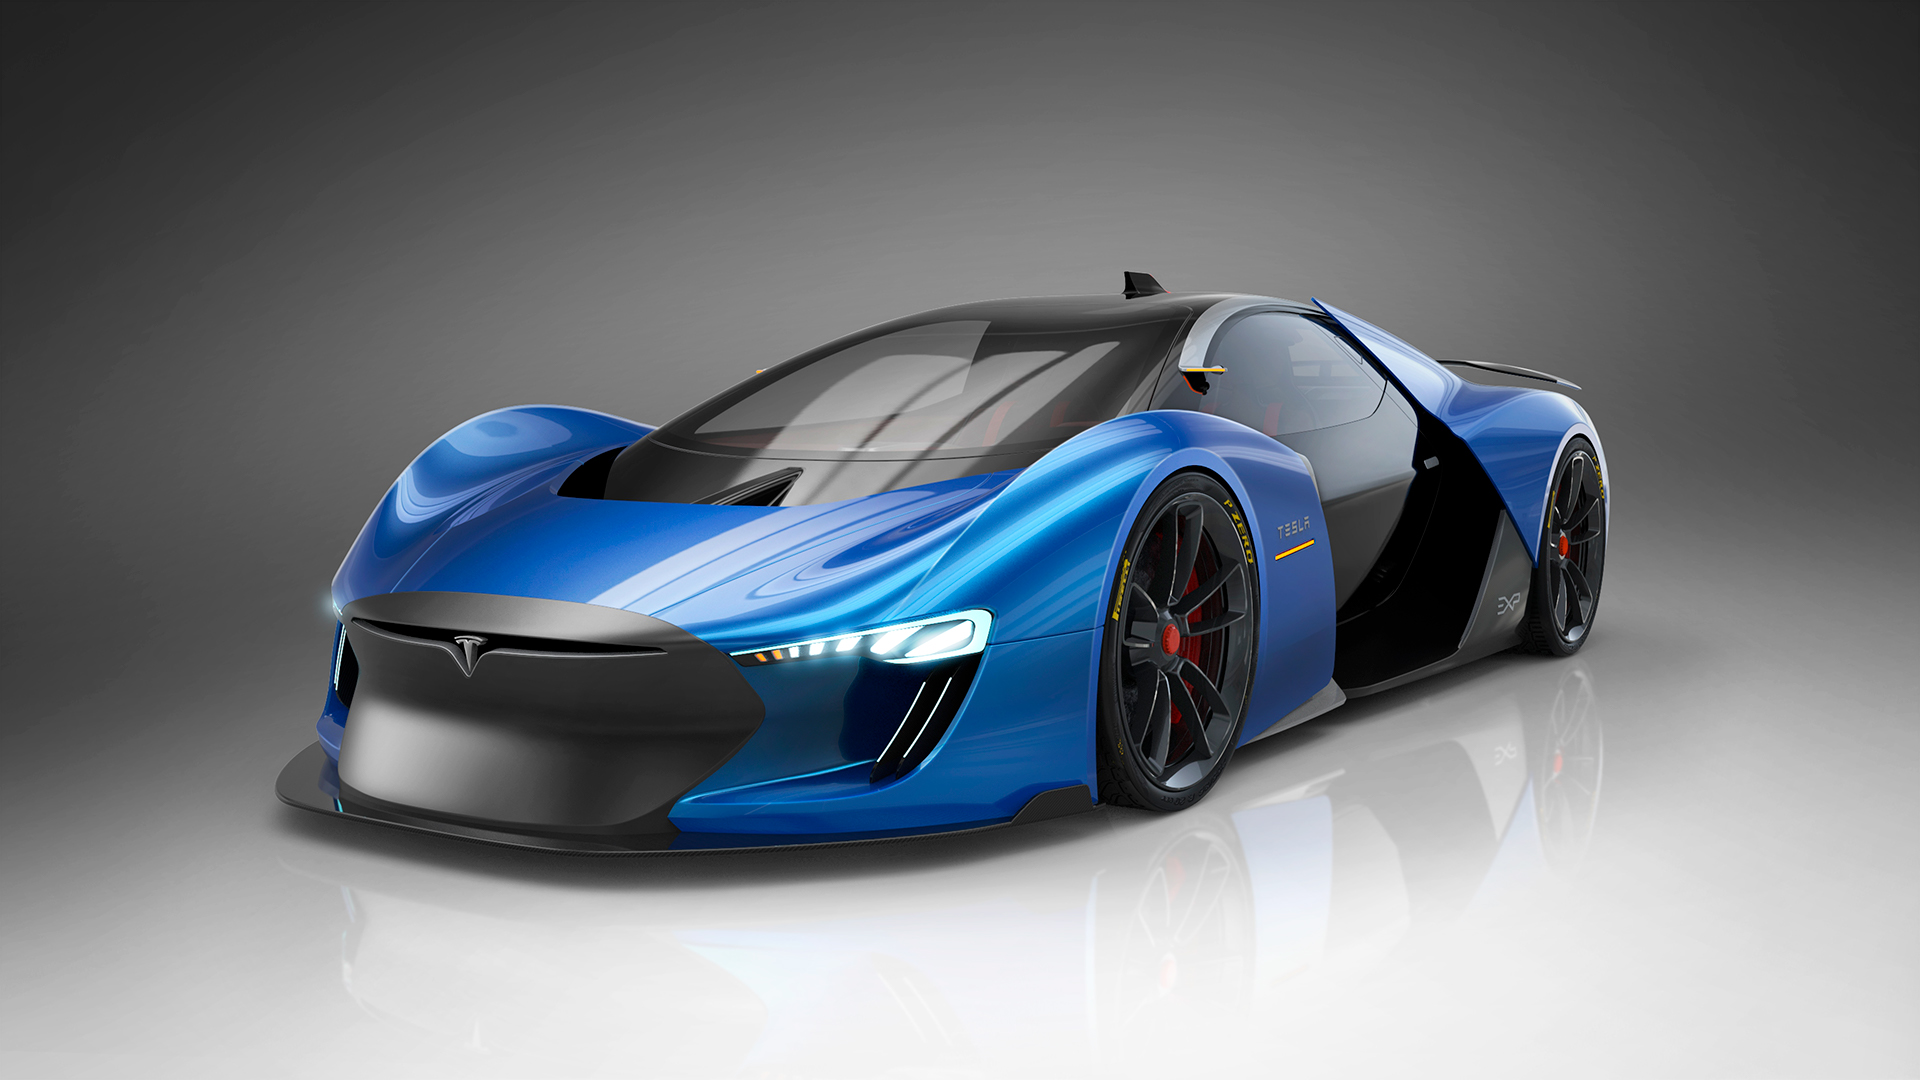 Designer's Vision Of An Electric Supercar The 'Tesla Model